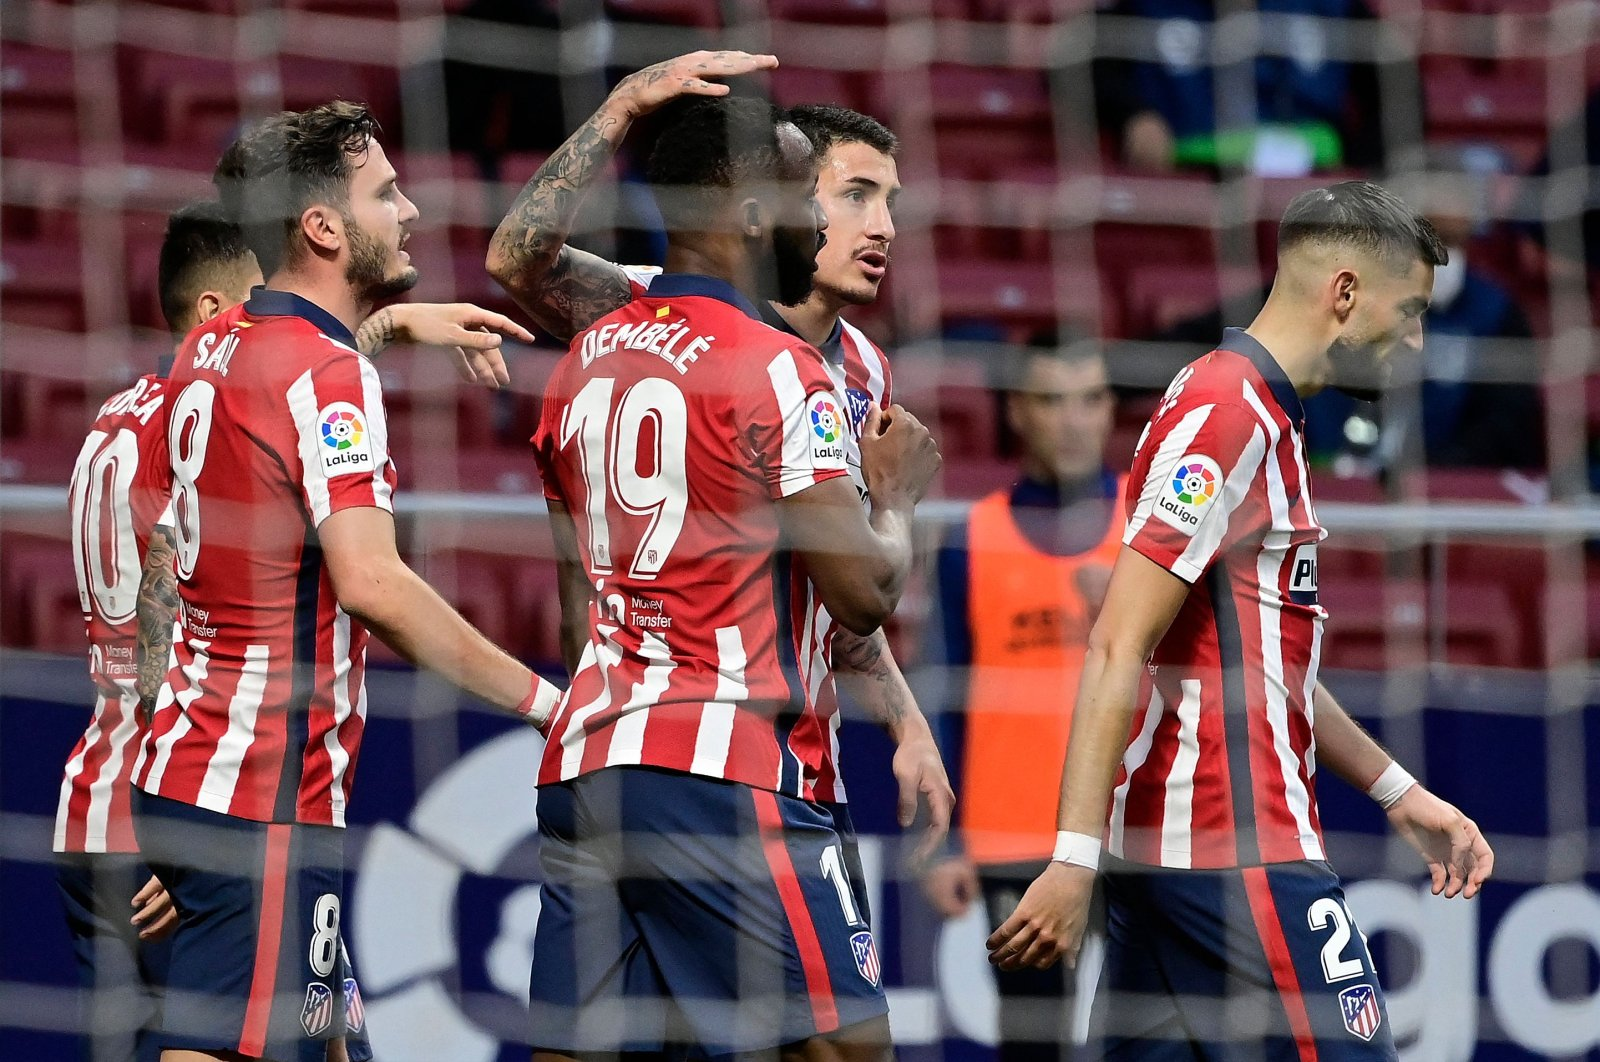 Atletico Madrid players celebrate a goal during the La Liga against Huesca at the Wanda Metropolitano stadium in Madrid, Spain, April 22, 2021. (AFP Photo)